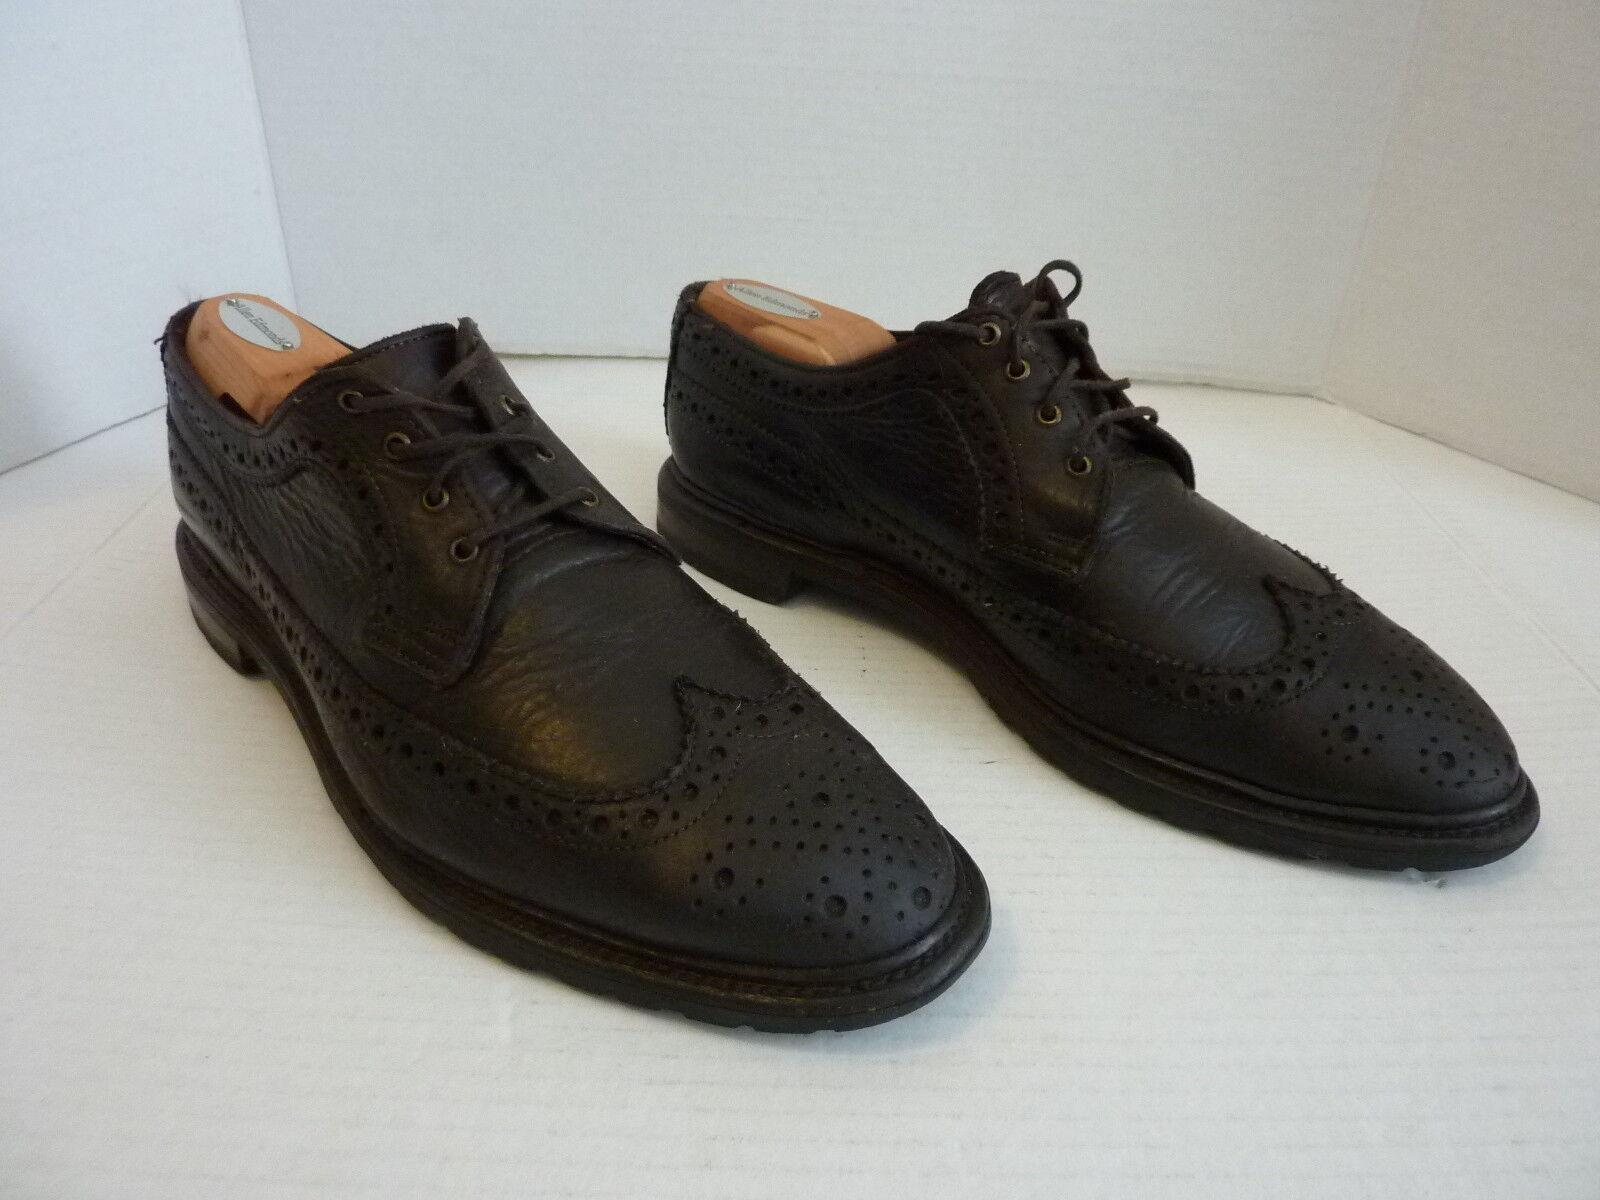 Uomo Allen Edmonds Dark marrone Oxford Shoe 9.5 D Pebble Pelle Wingtip